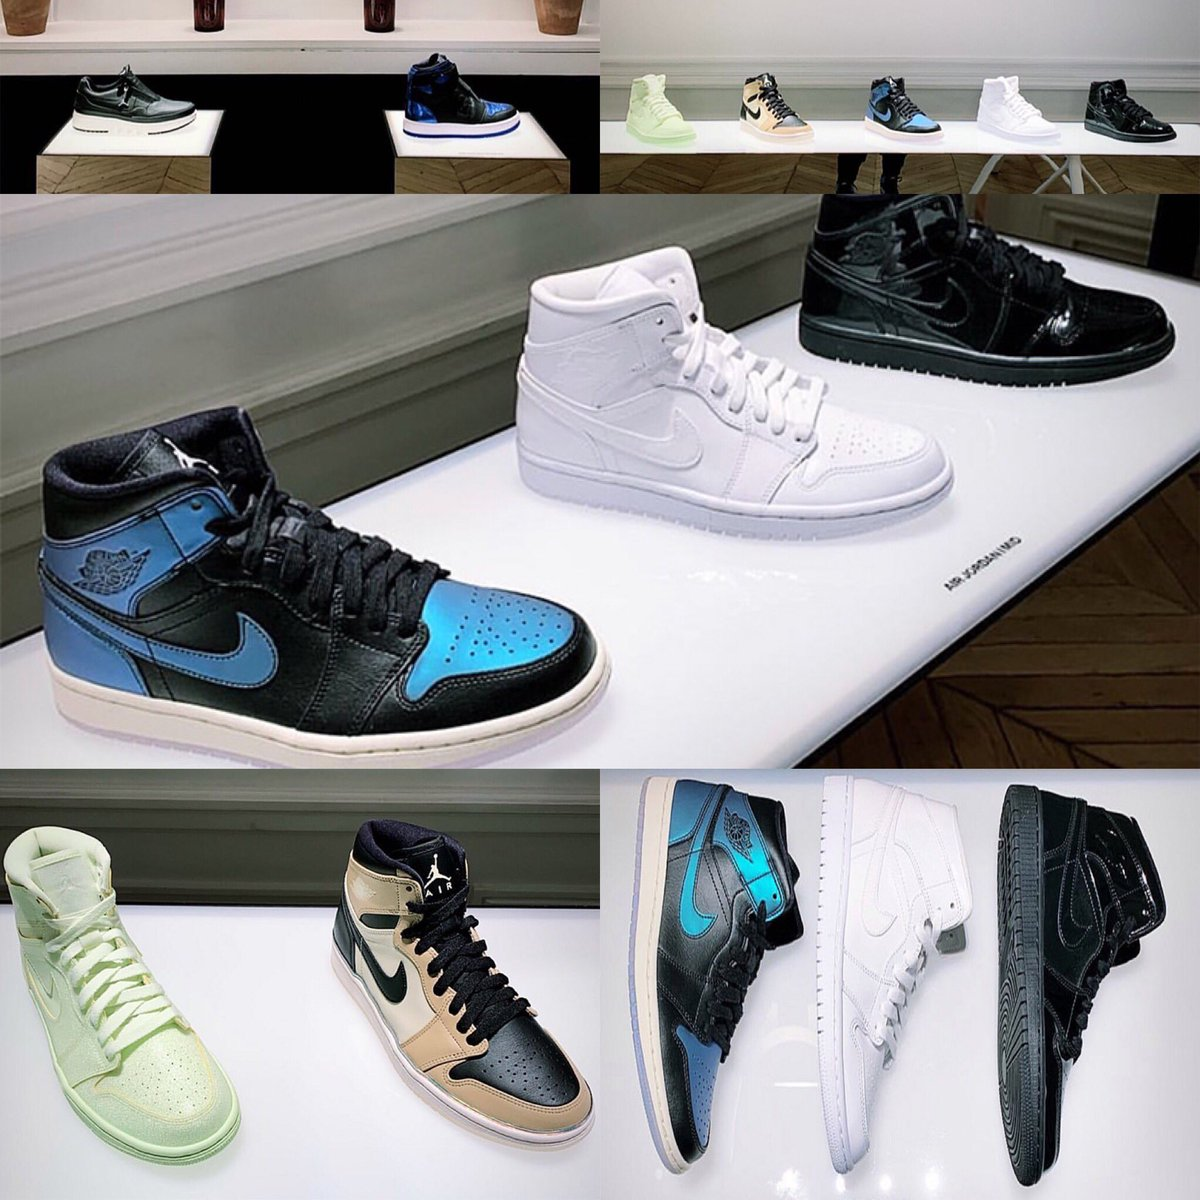 df9dba00d58f Anson1019 shoesaddict Shoes in 2019 t